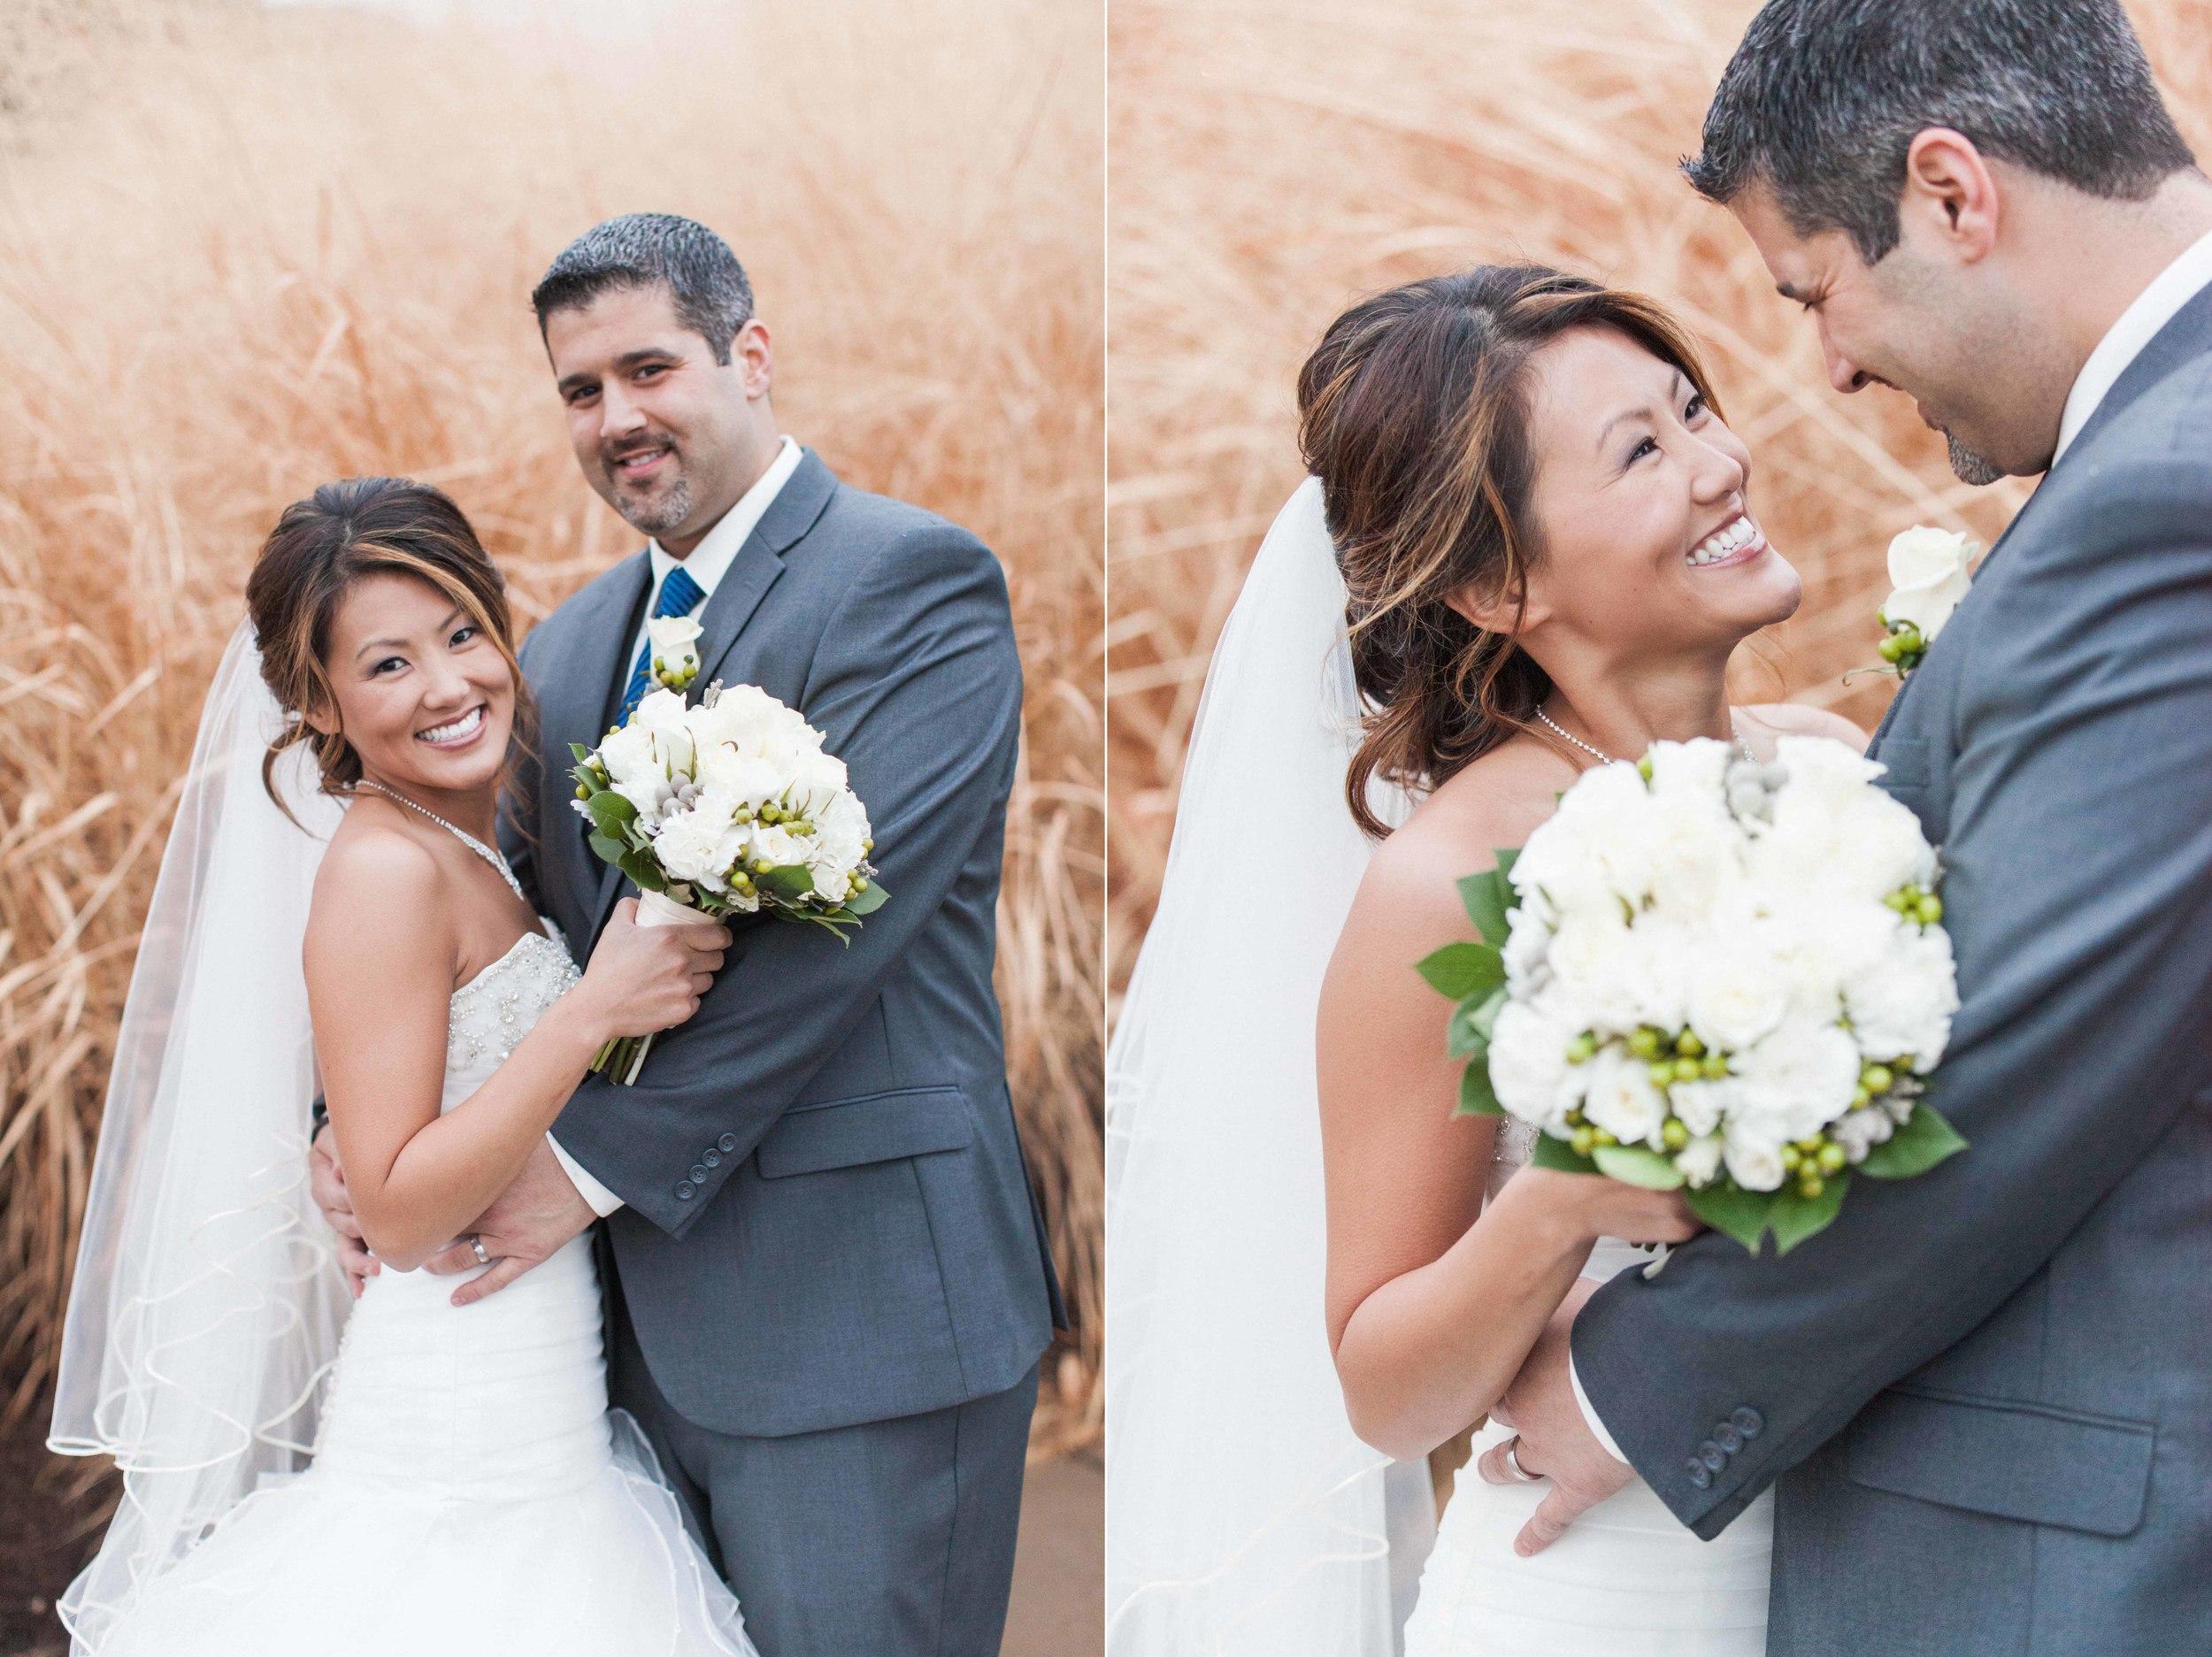 Sqwires Wedding Photos-1002 copy.jpg